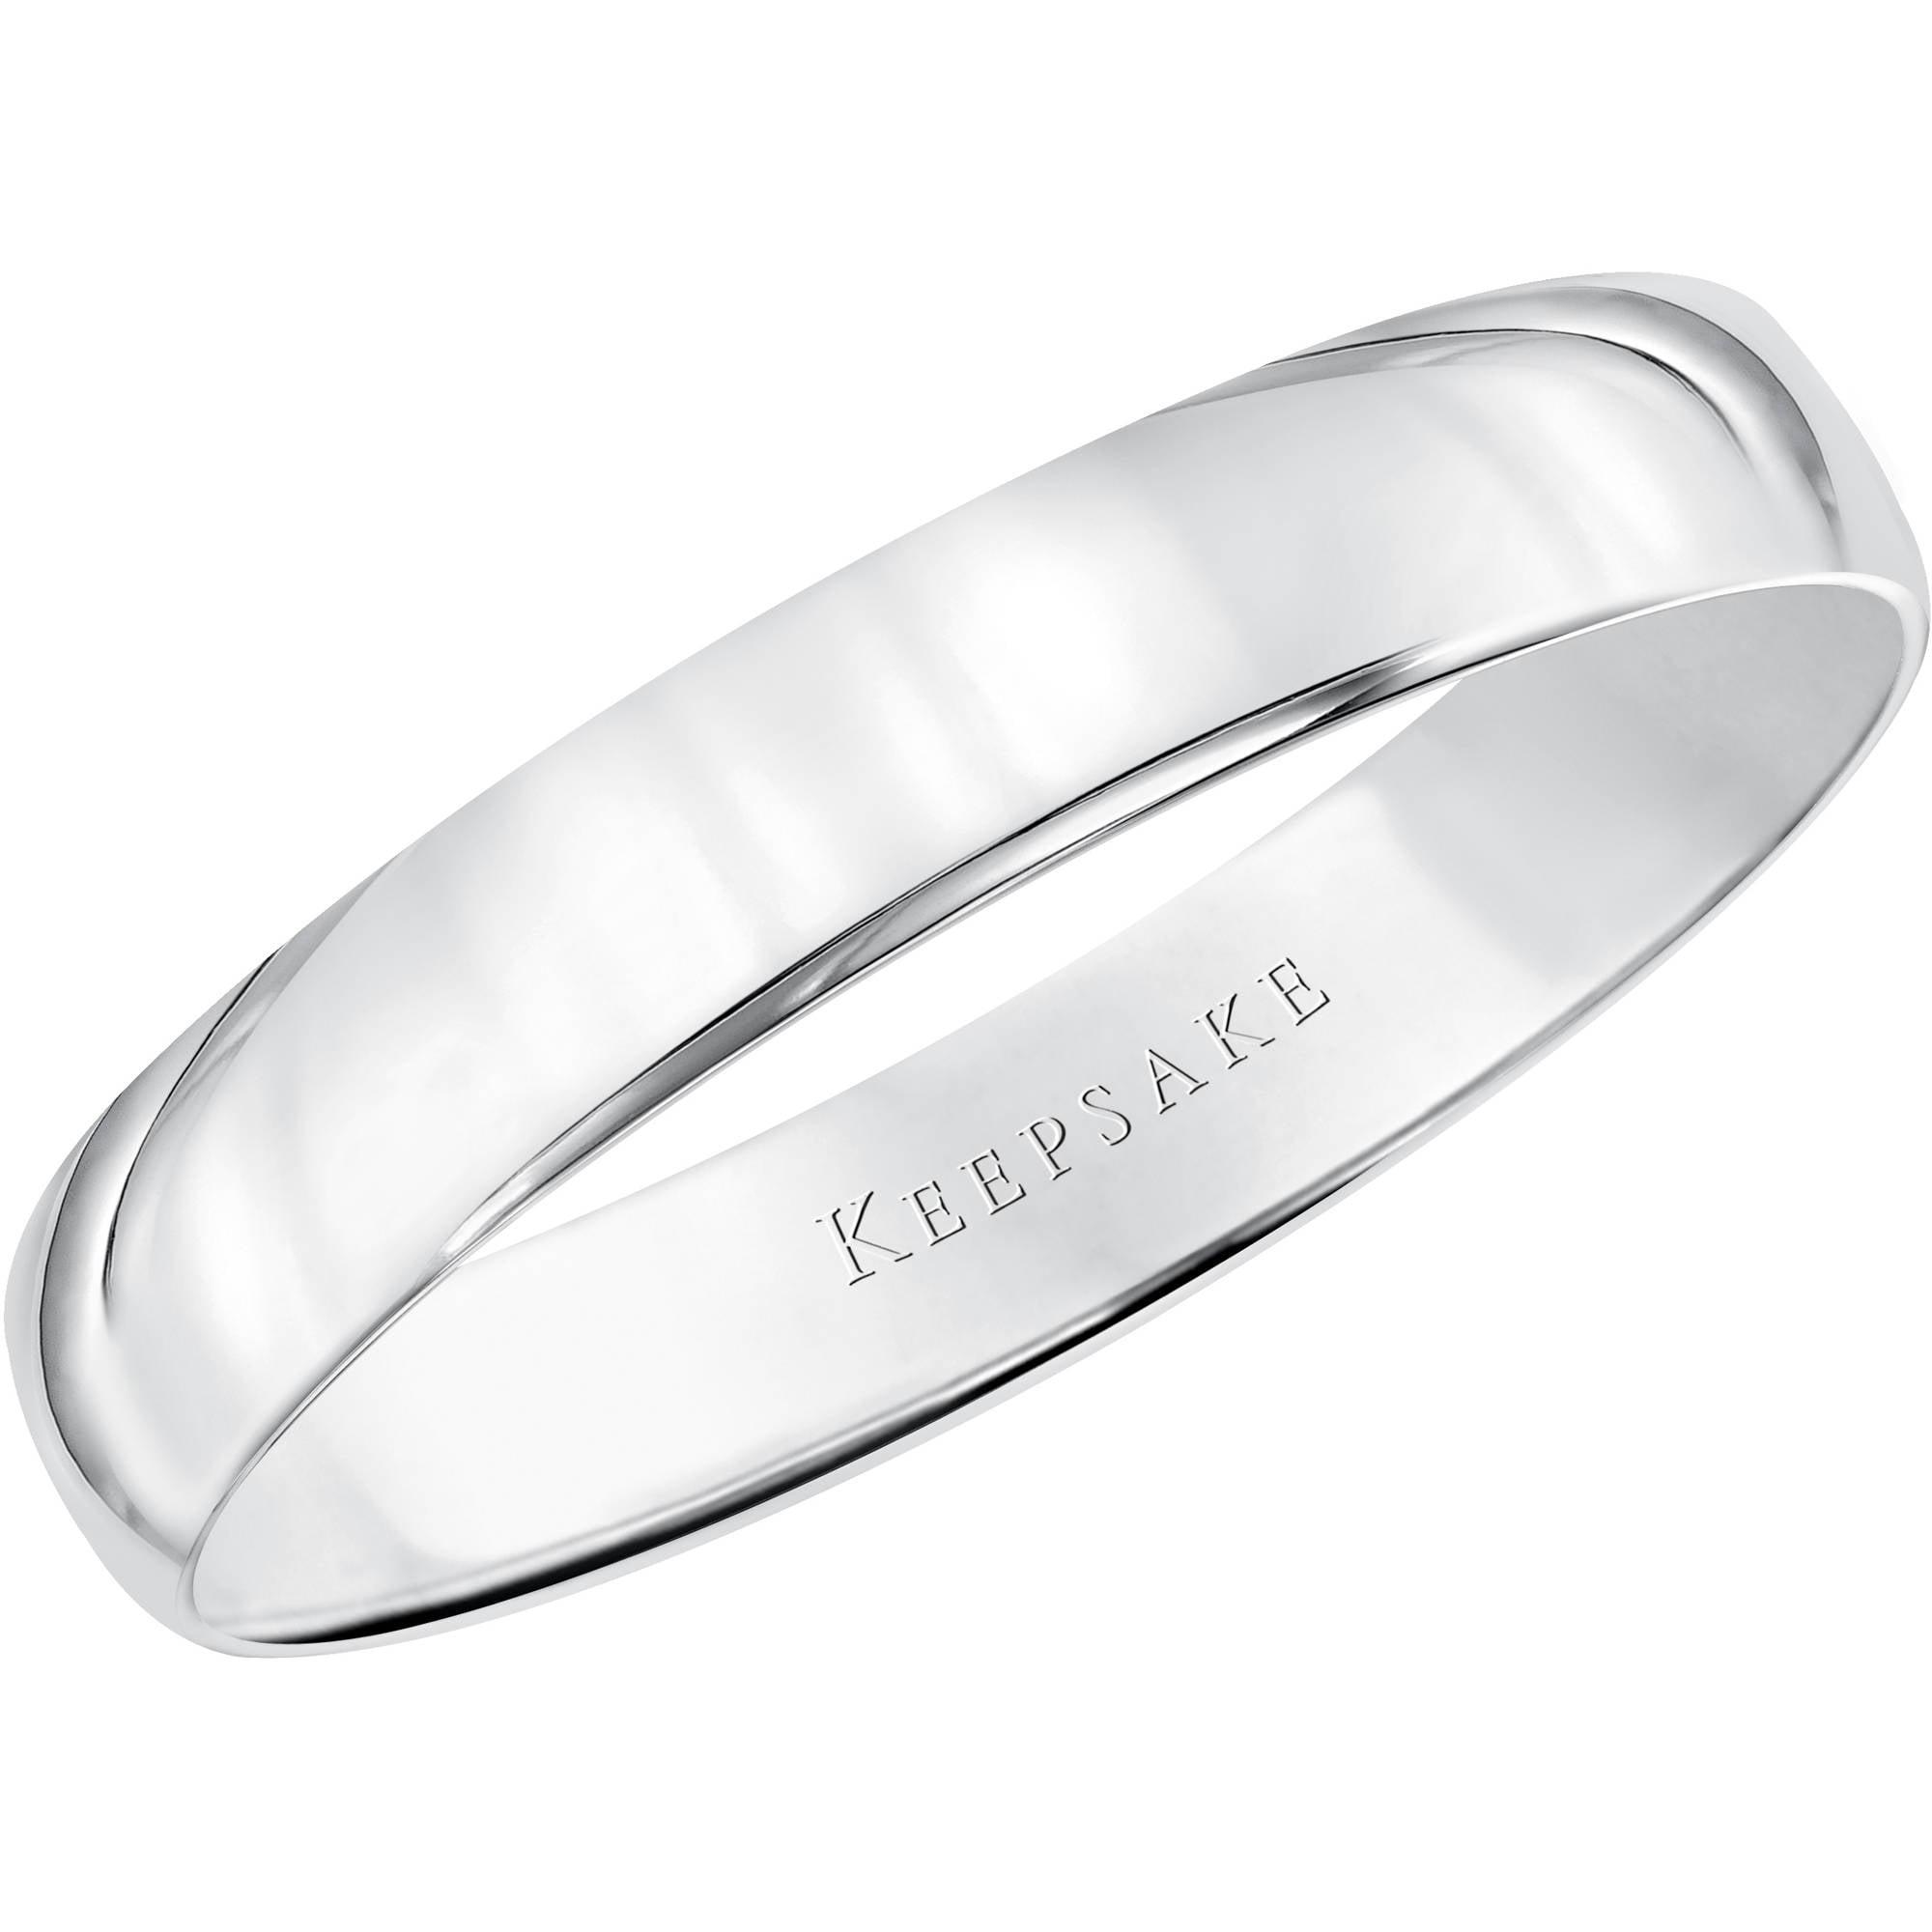 Keepsake 10kt White Gold Comfort Fit Wedding Band 4mm